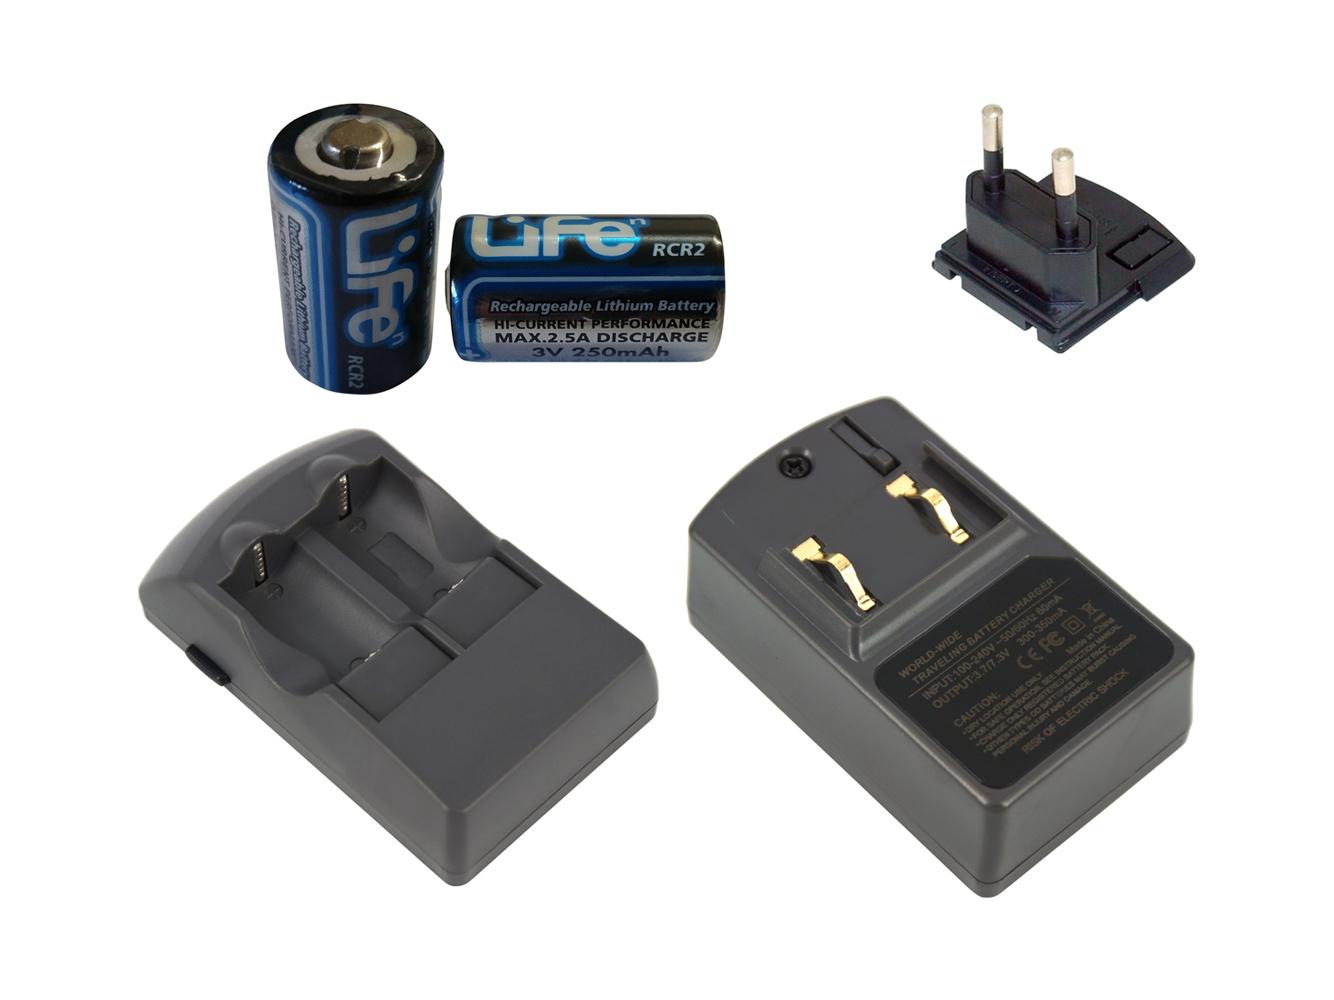 Battery Charger for YASHICA Acclaim 300, Acclaim 4000, Acclaim Zoom 300